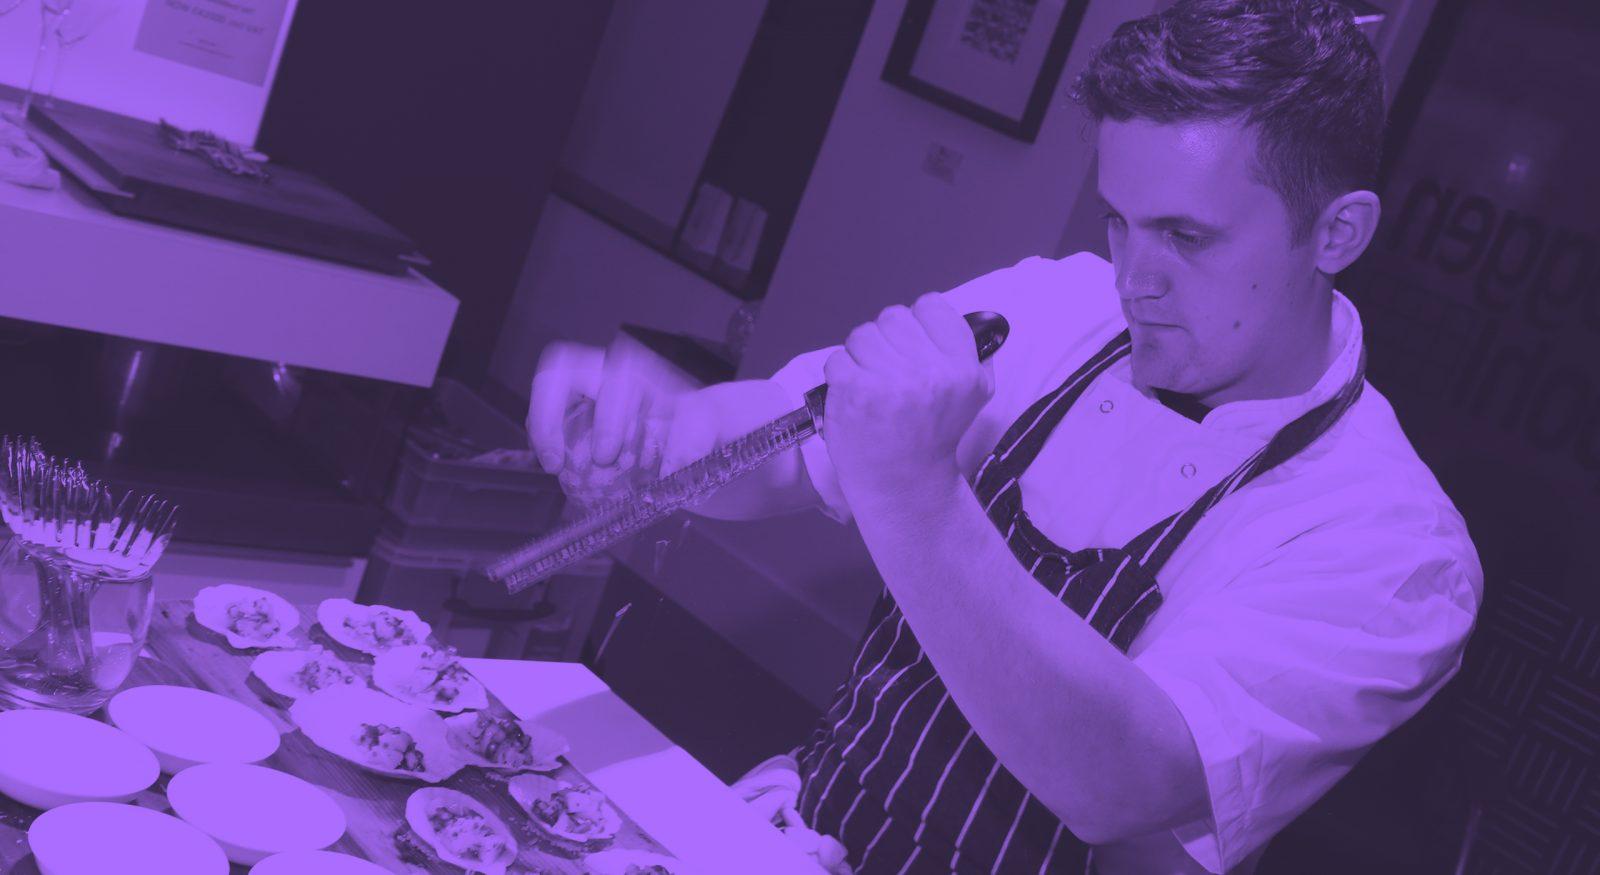 Chef named Jon dishing up food